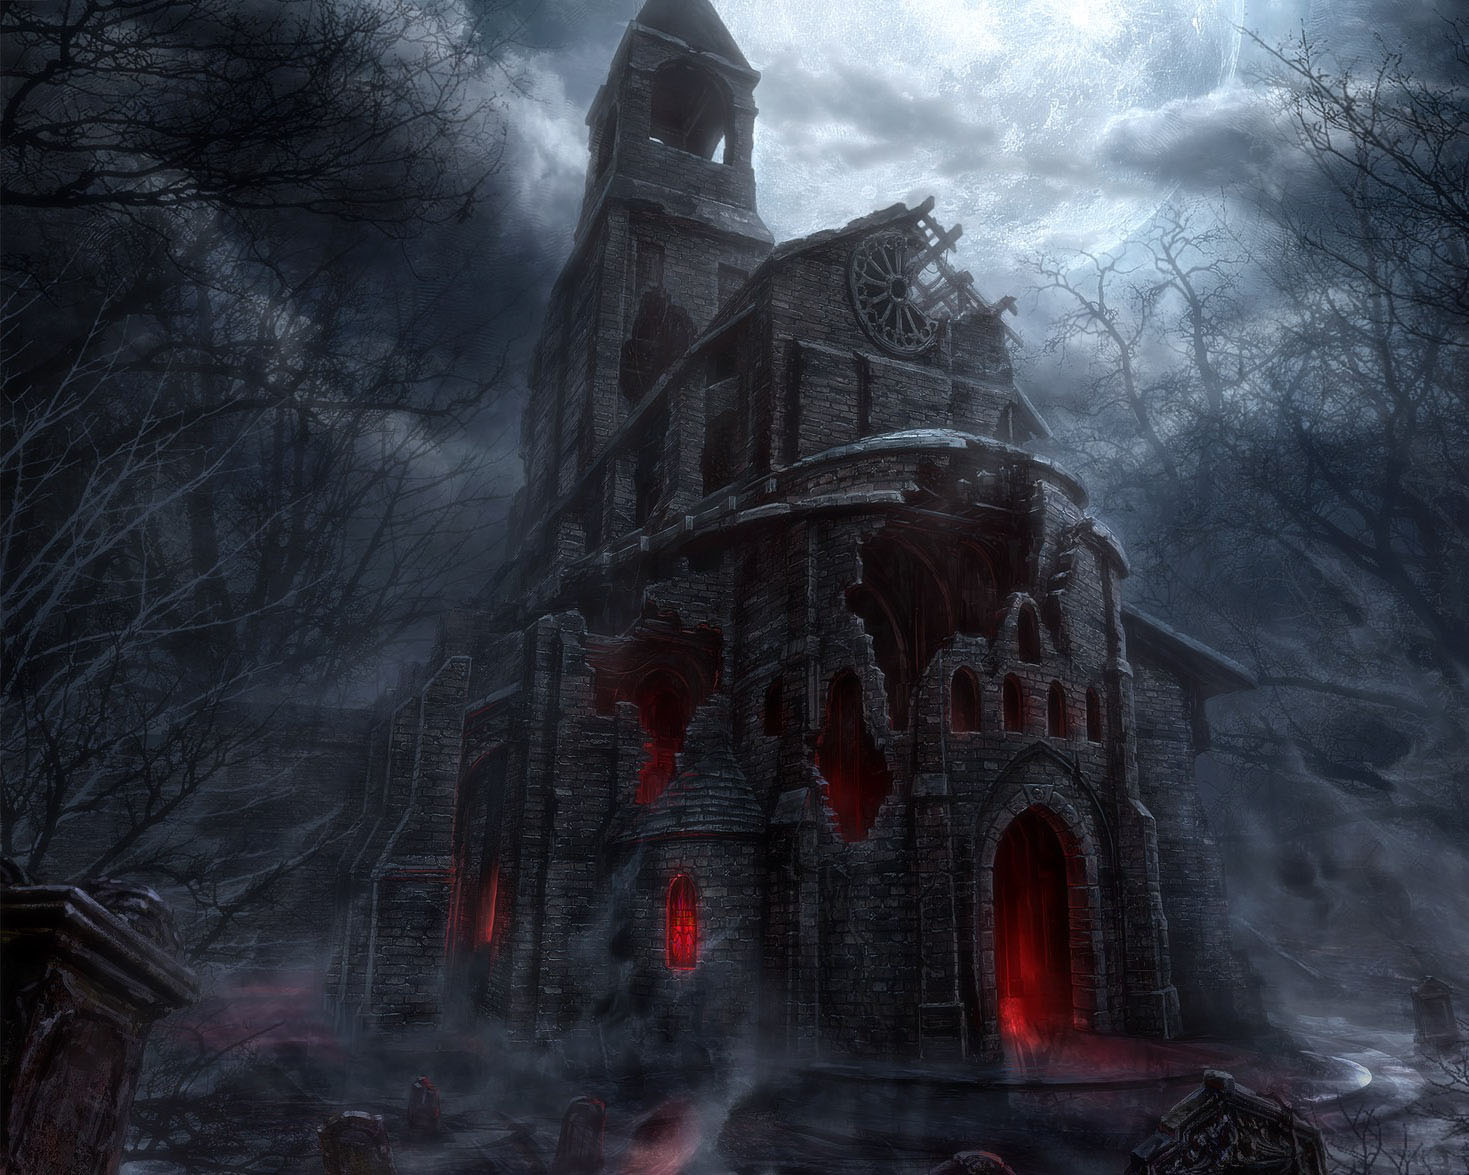 Fantasy Forest 3d Live Wallpaper Horror Achtergronden Hd Wallpapers